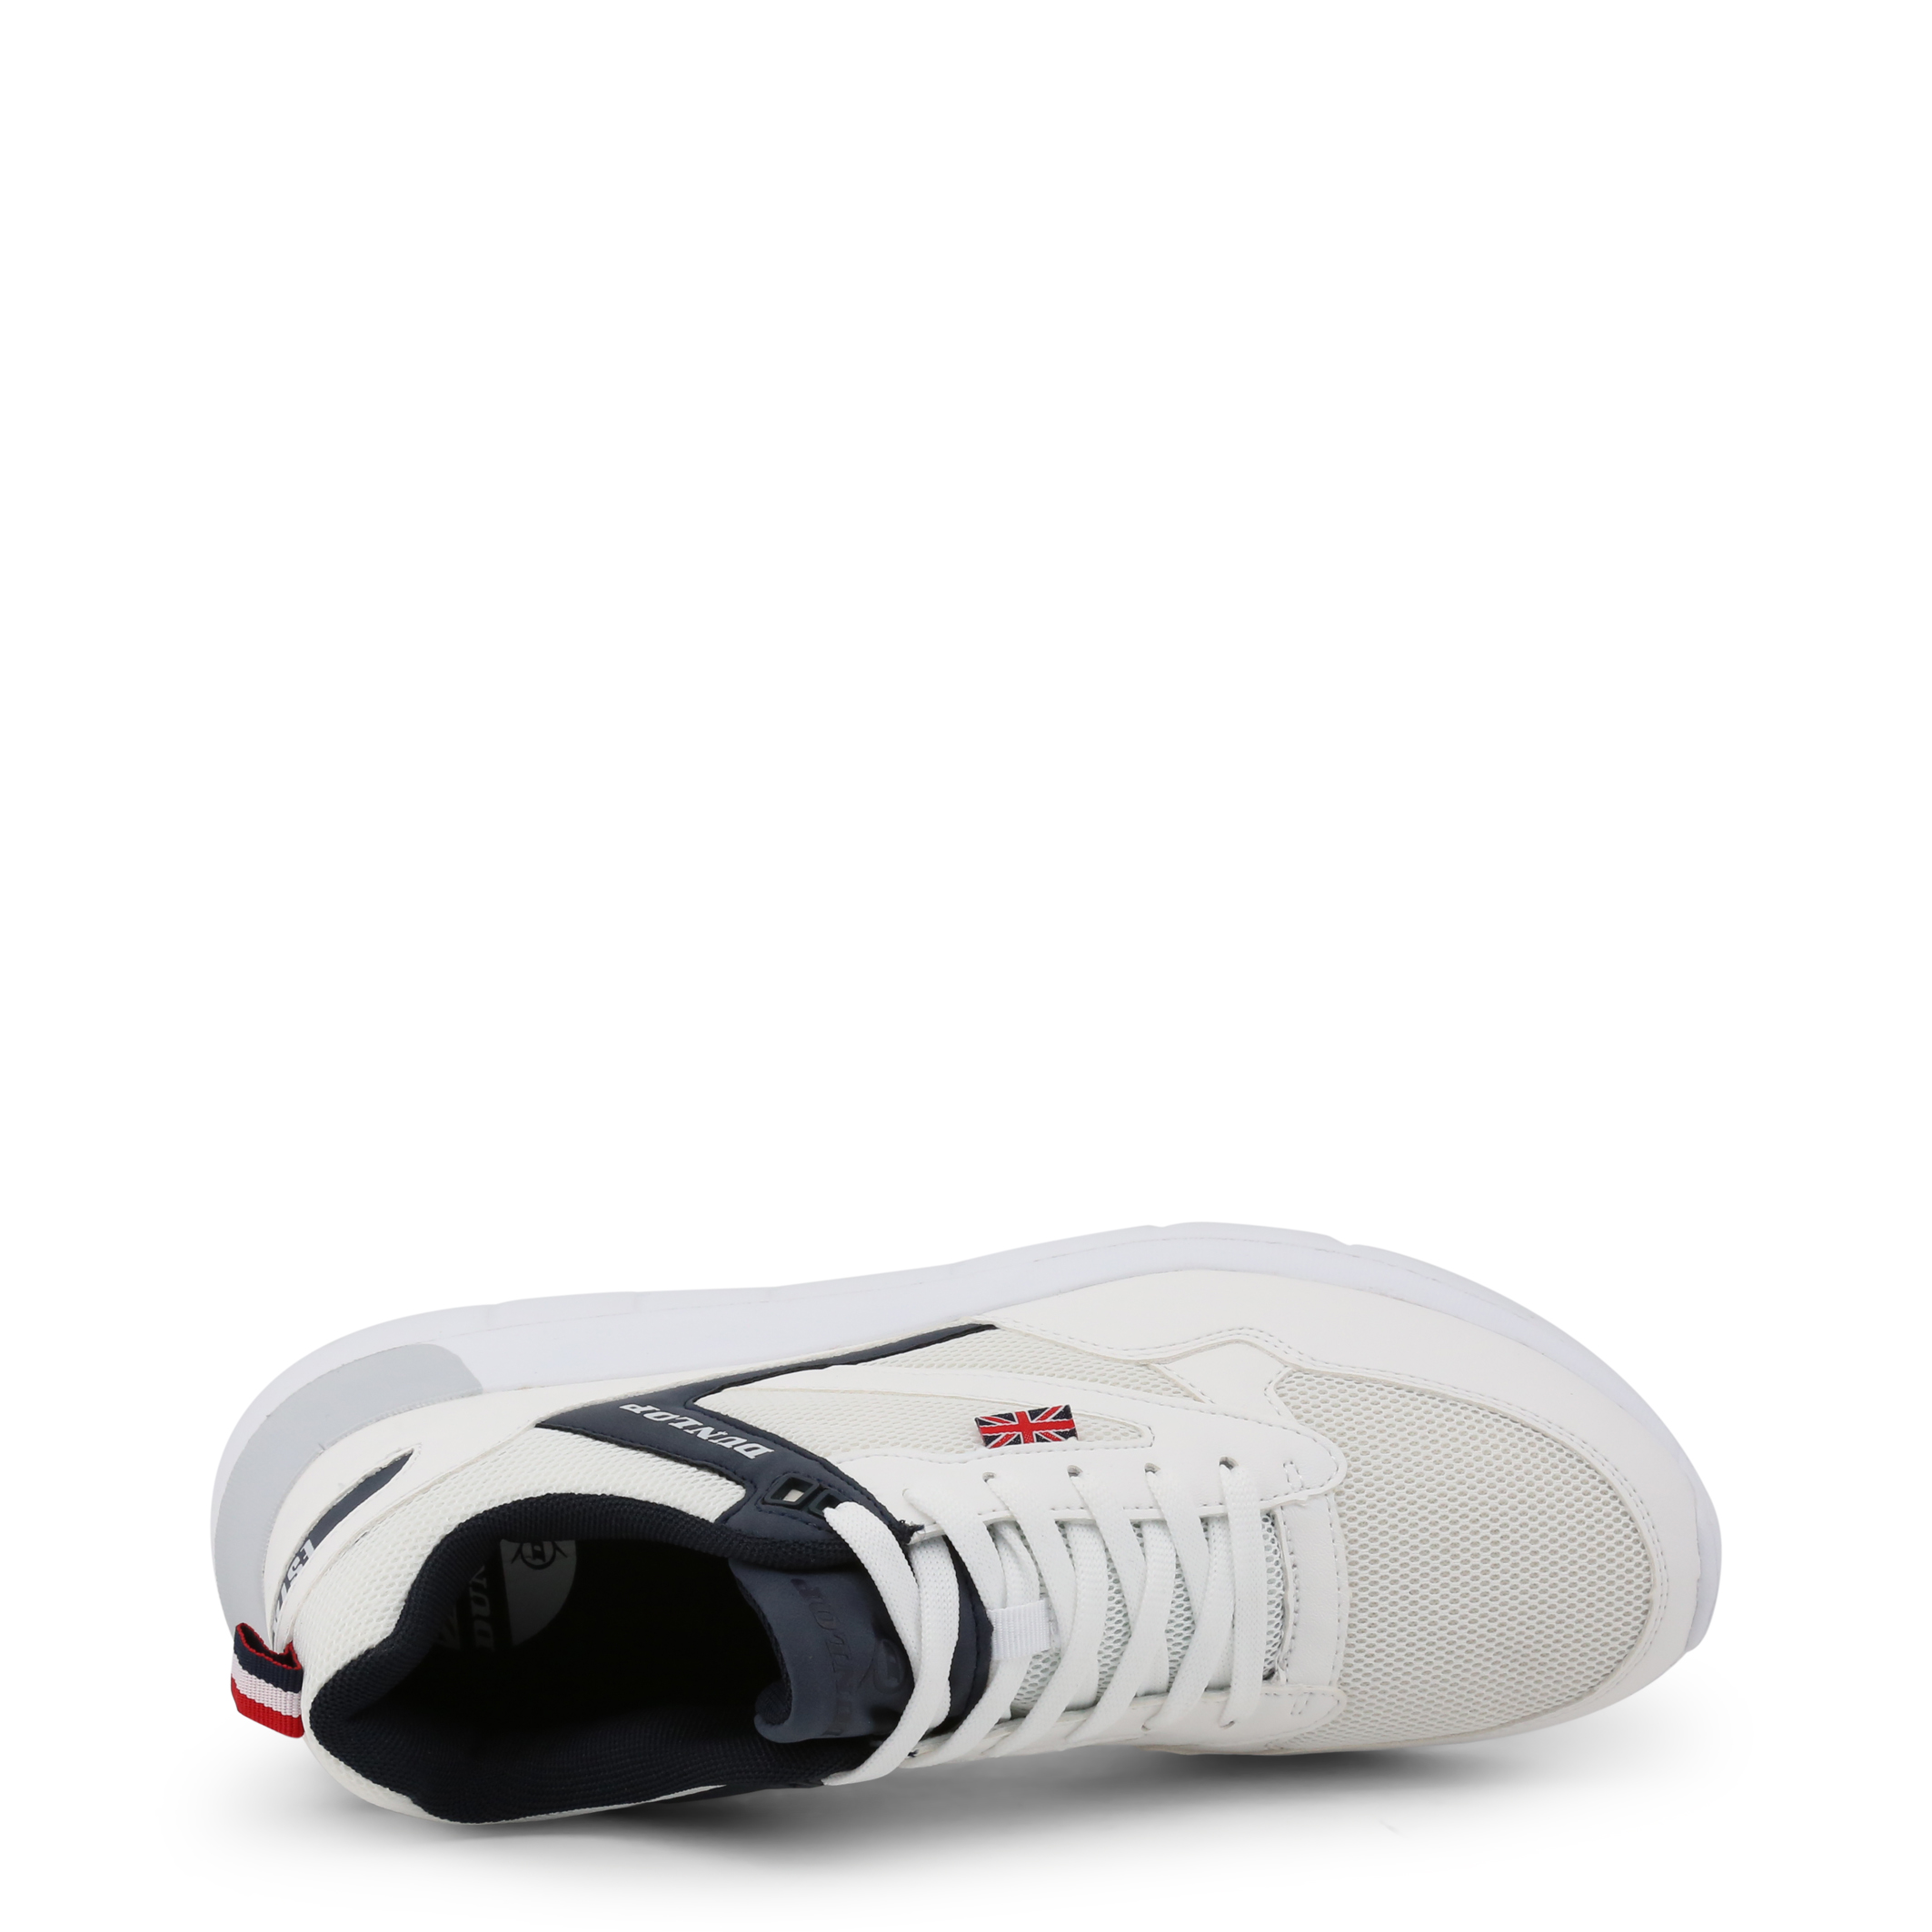 Baskets / Sport  Dunlop 35365 white